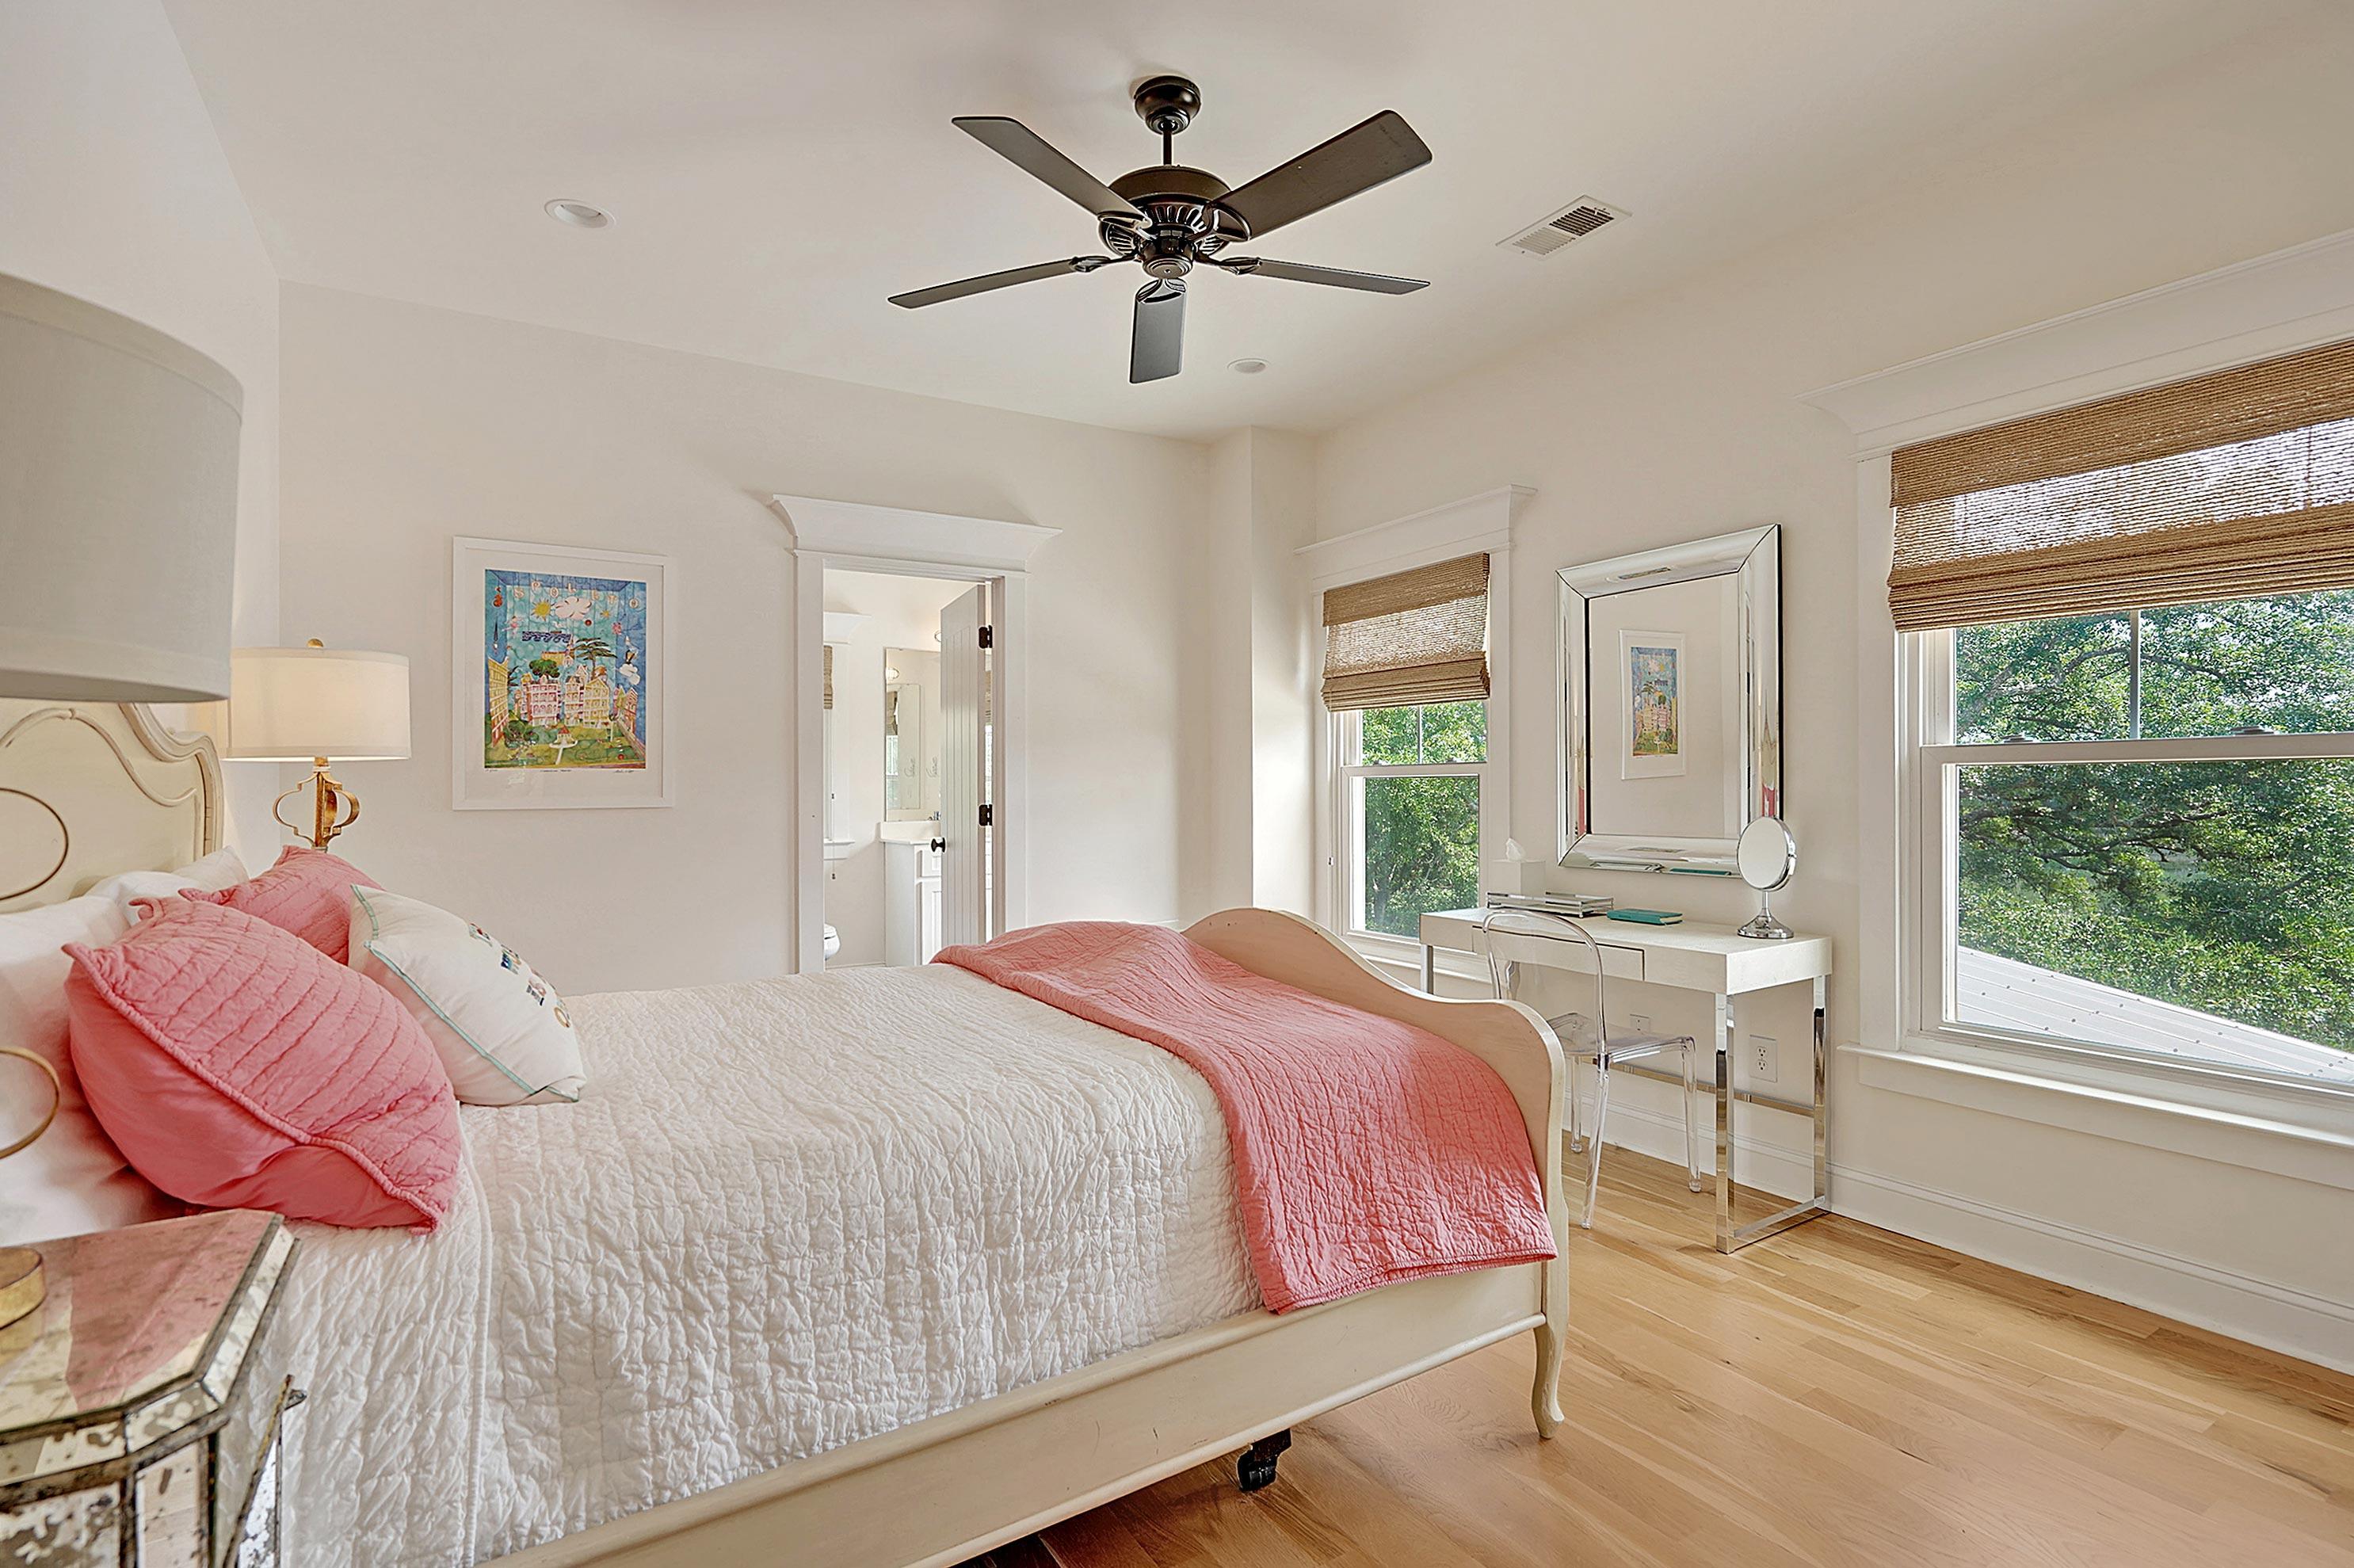 Grassy Creek Homes For Sale - 294 River Oak, Mount Pleasant, SC - 15